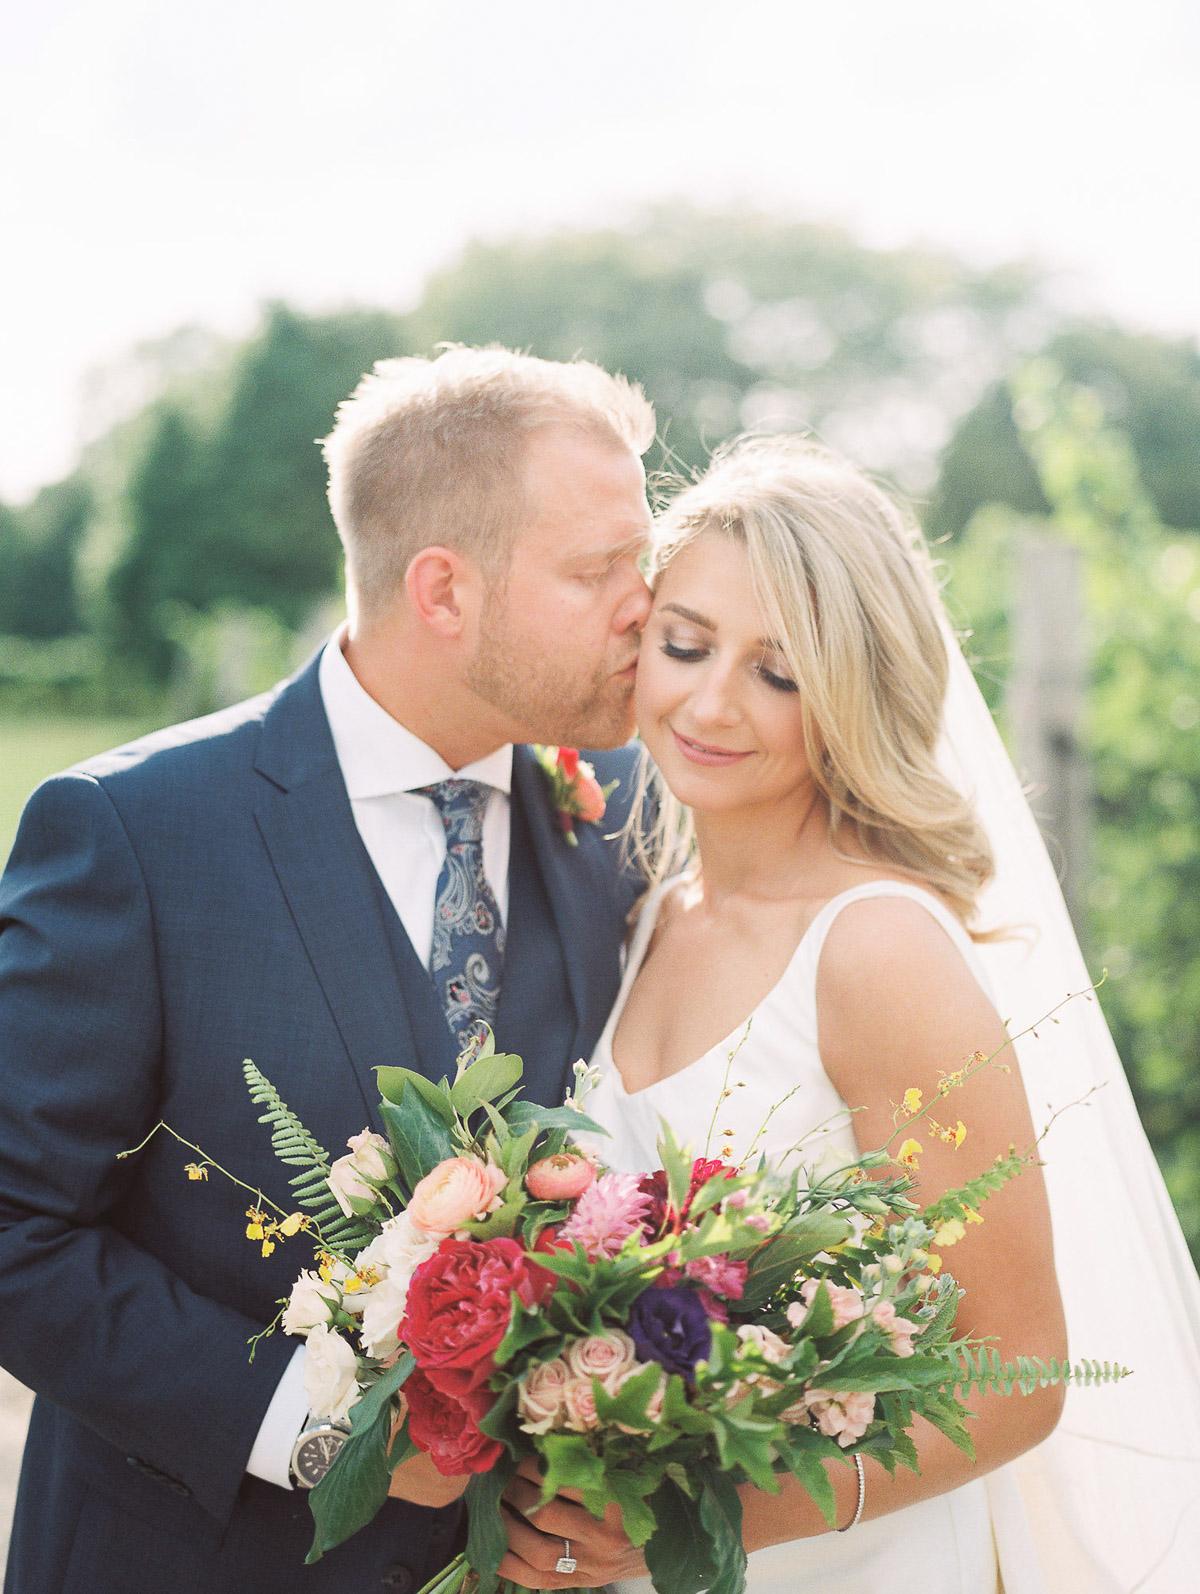 julia-park-photography-vineyard-bride-swish-list-stratus-winery-niagara-on-the-lake-wedding-23.jpg